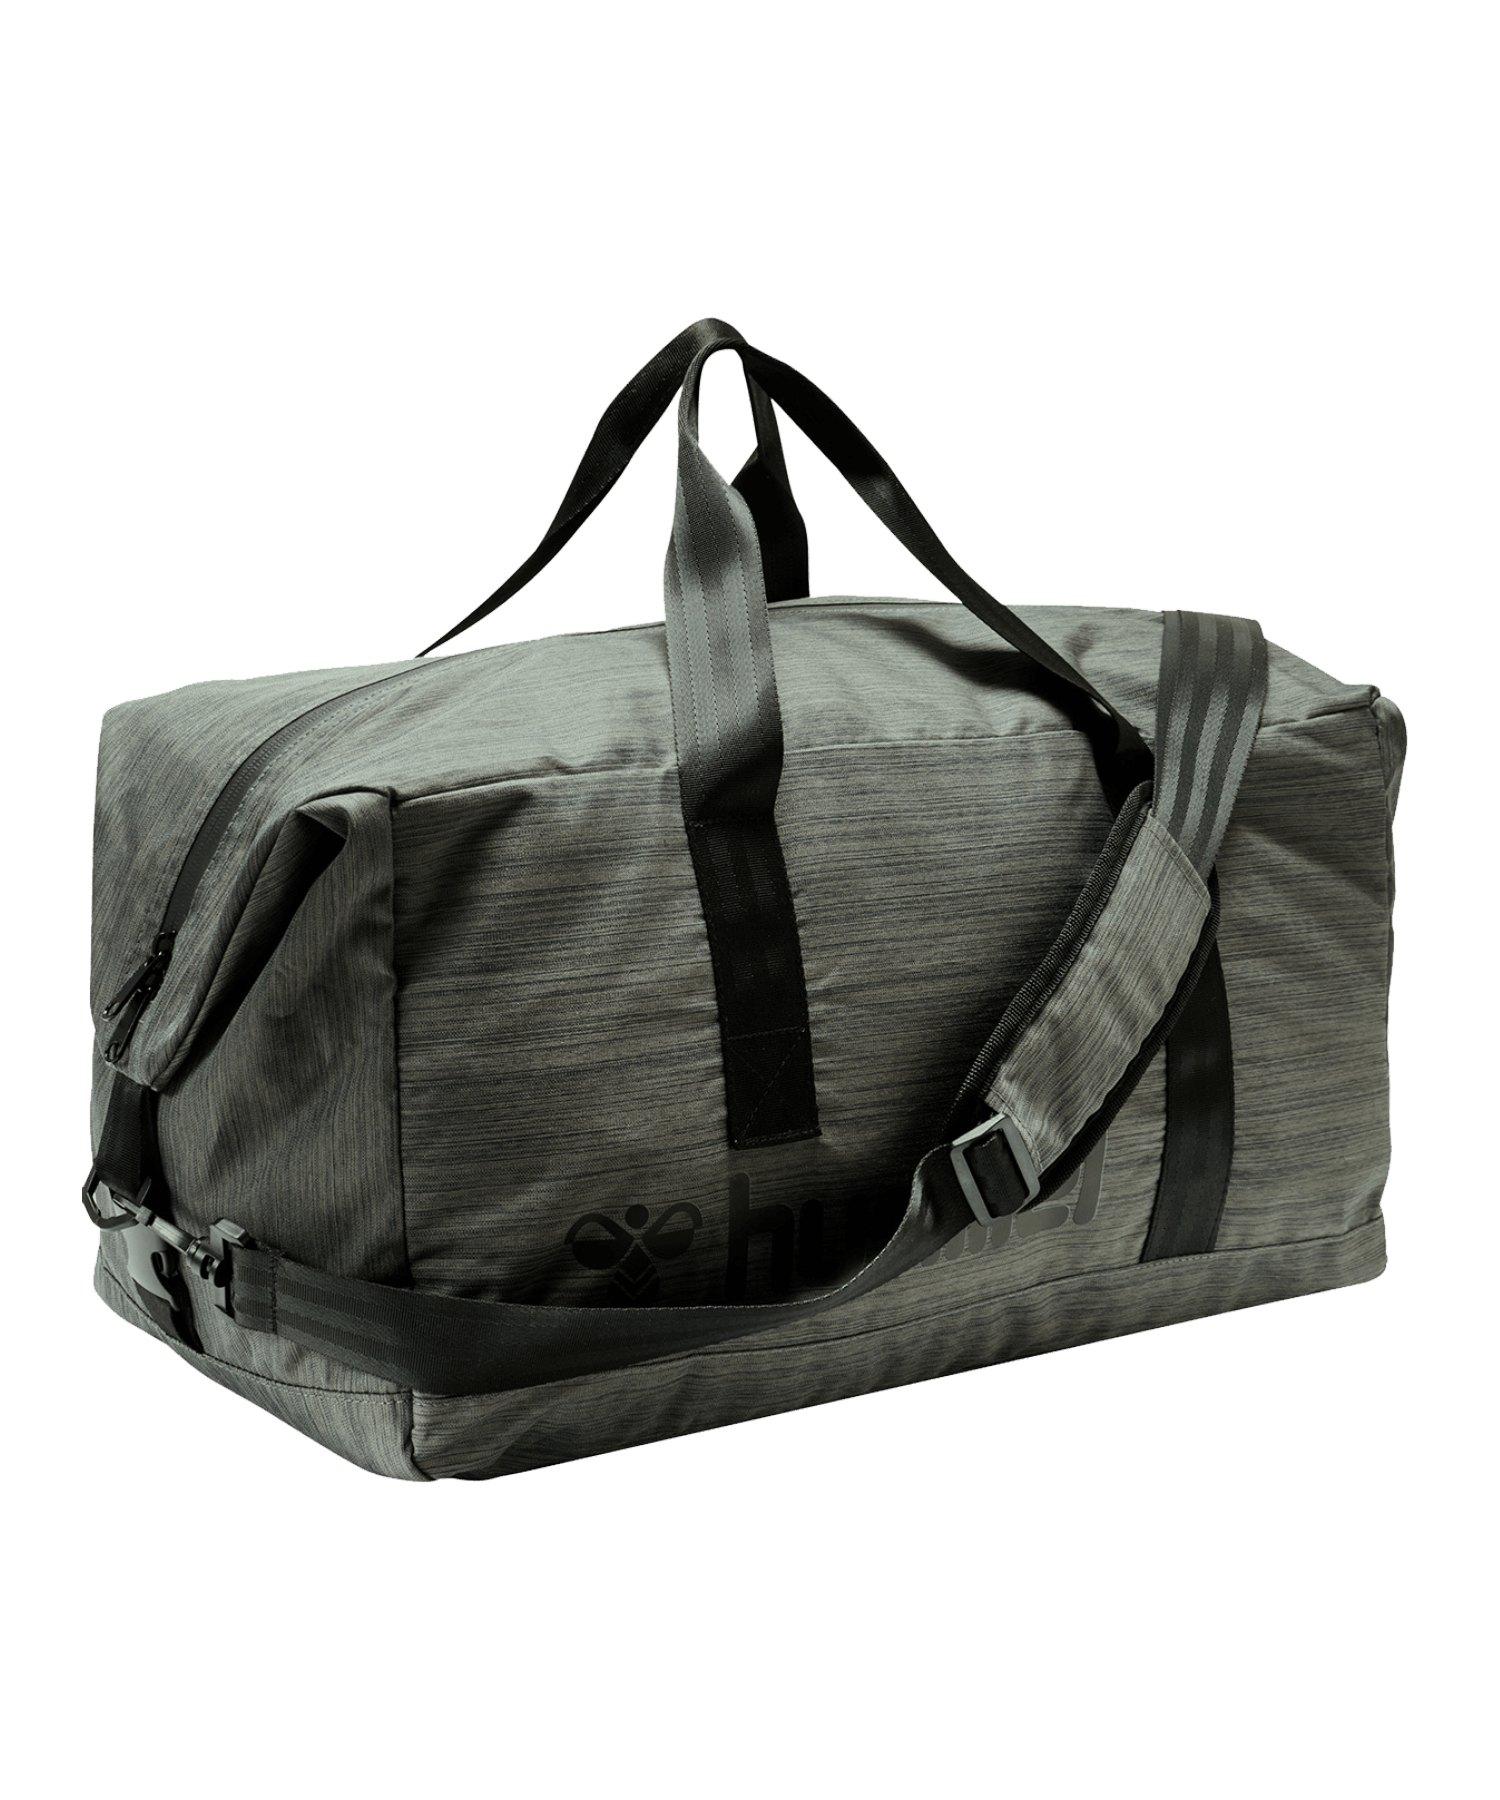 Hummel Urban Duffel Bag Small Grau F1502 - grau